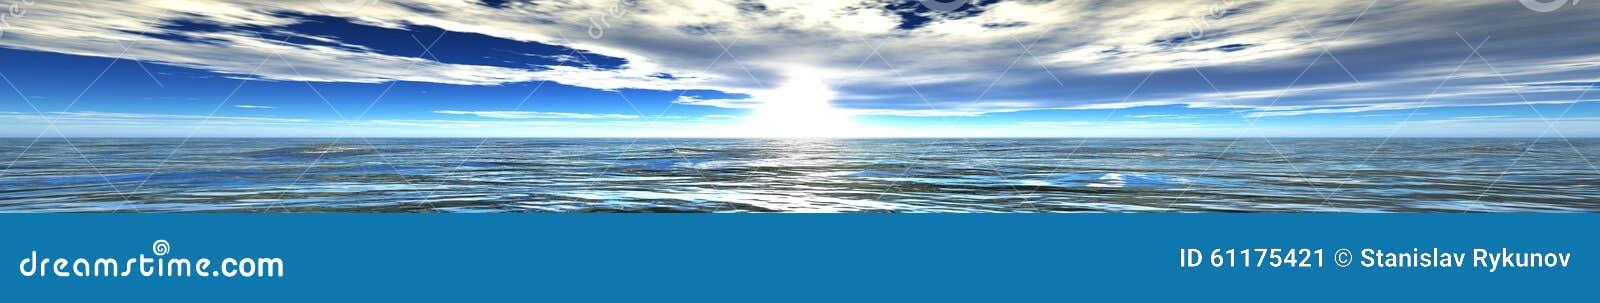 travel sea wallpaper panorama - photo #4